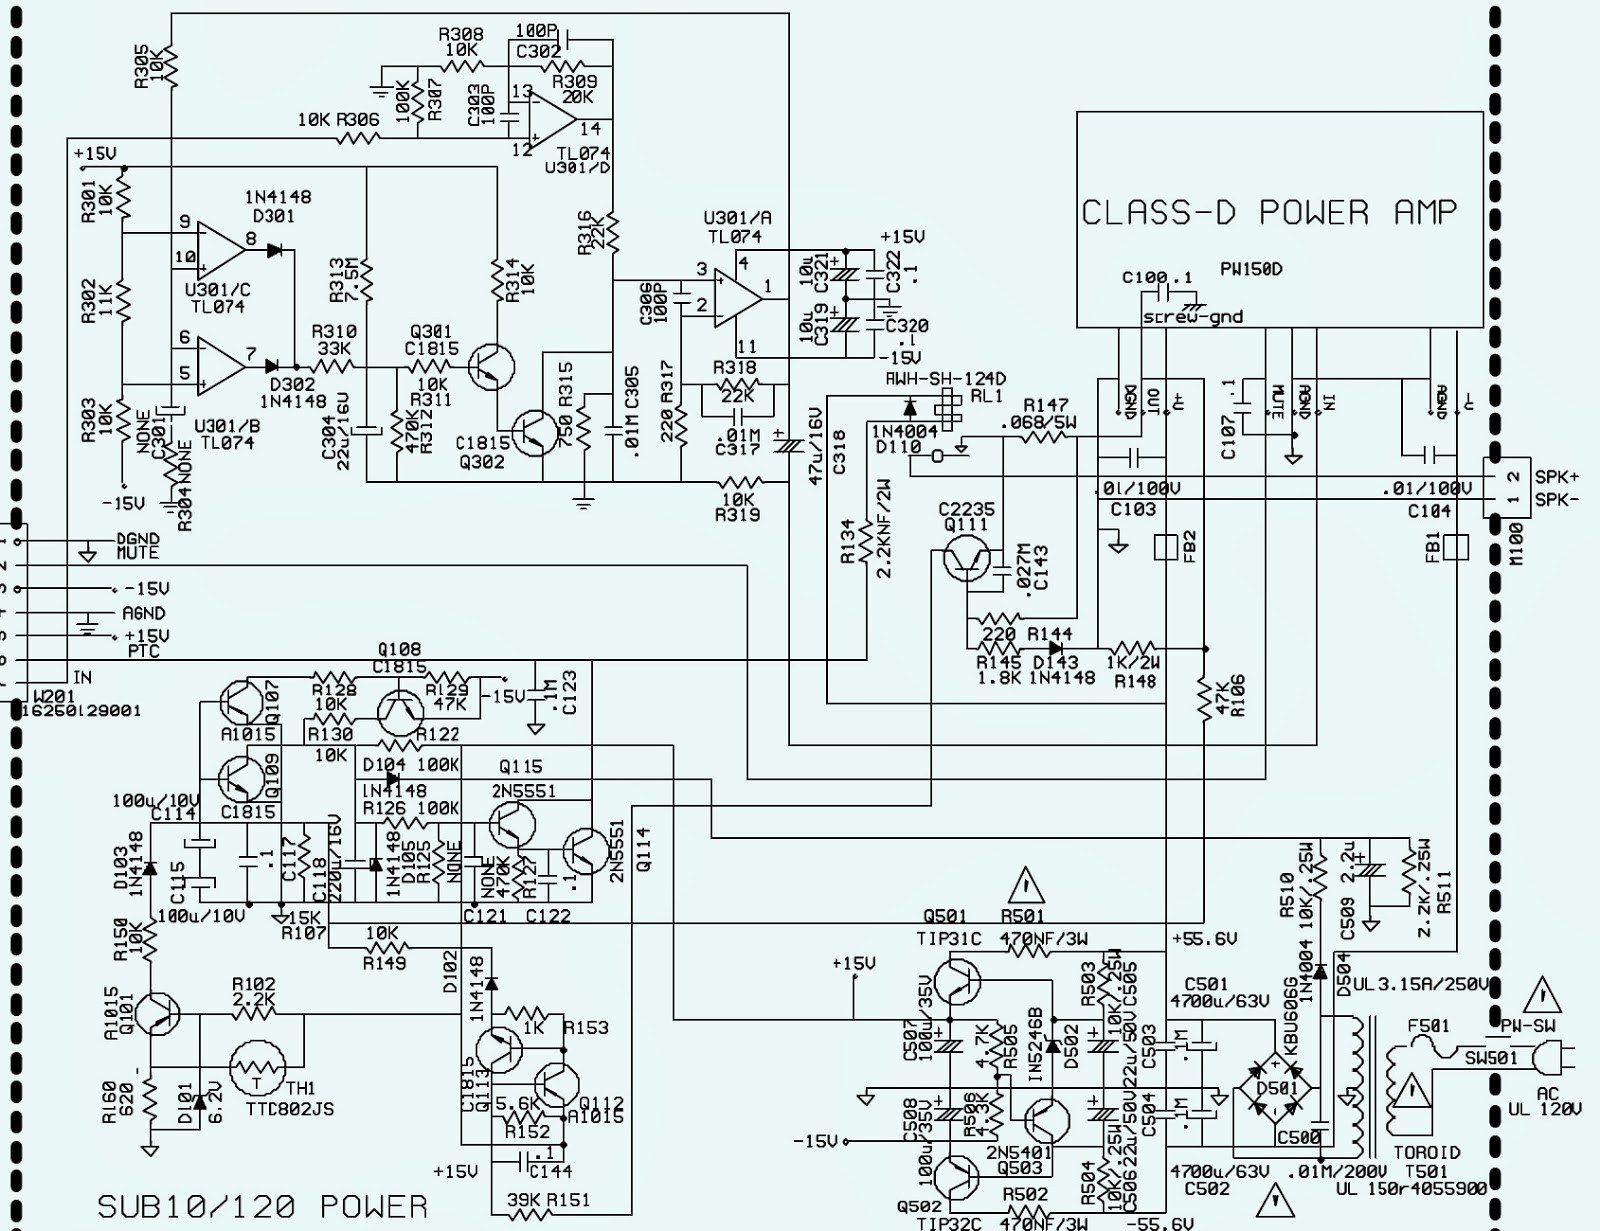 jbl powered subwoofer schematic diagram universal wiring diagram 600 ampsubwoofer schematic circuit diagram electro help wiring [ 1600 x 1231 Pixel ]